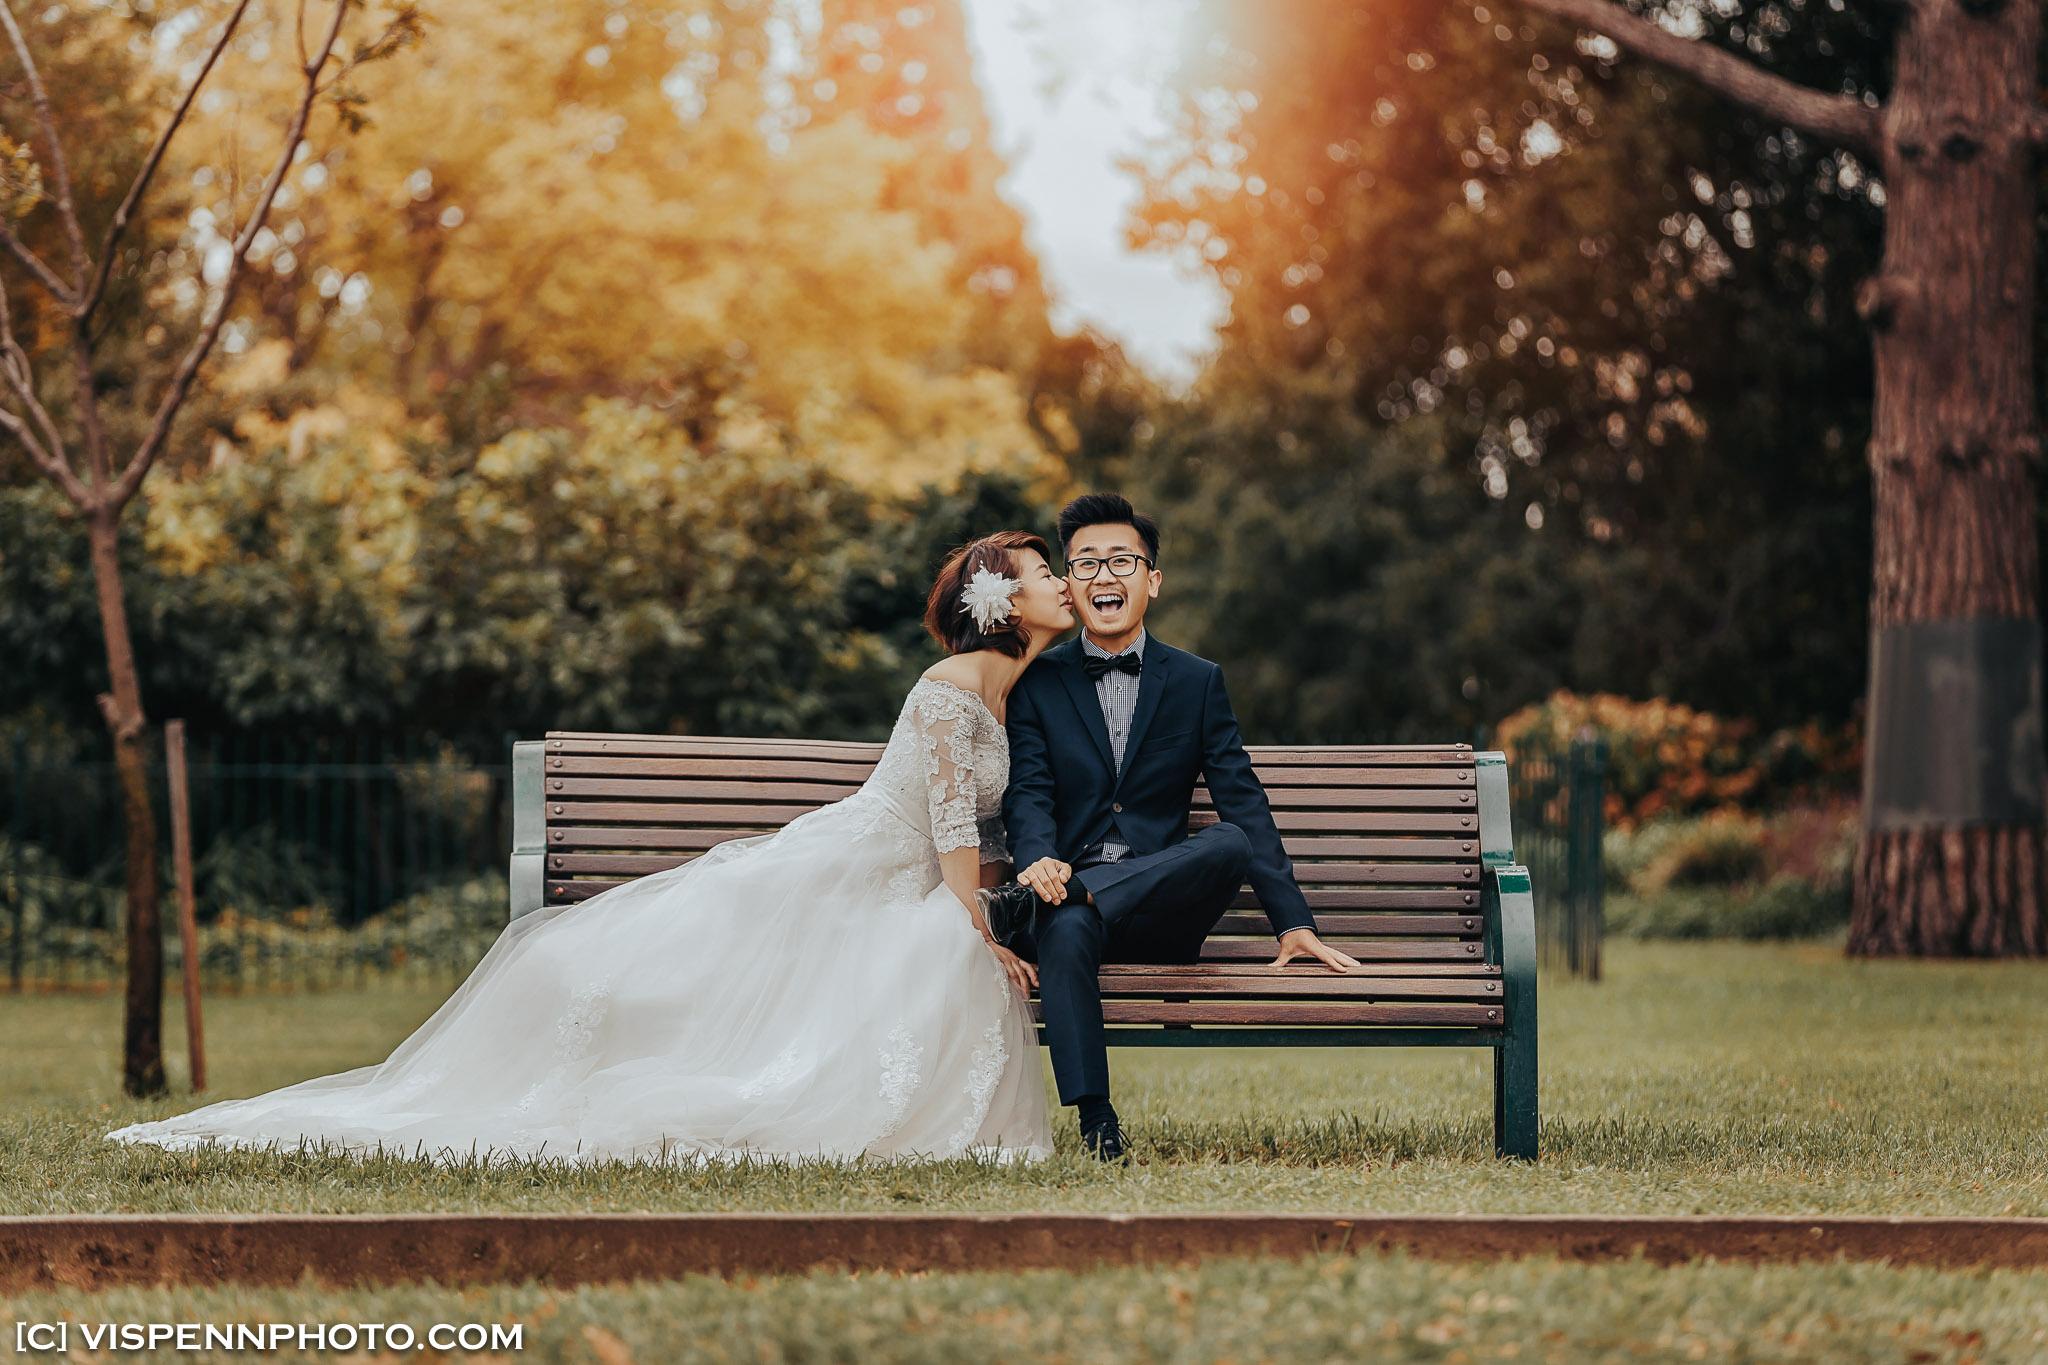 PRE WEDDING Photography Melbourne VISPENN 墨尔本 婚纱照 结婚照 婚纱摄影 VISPENN DaisyDanChenPreWedding 0976